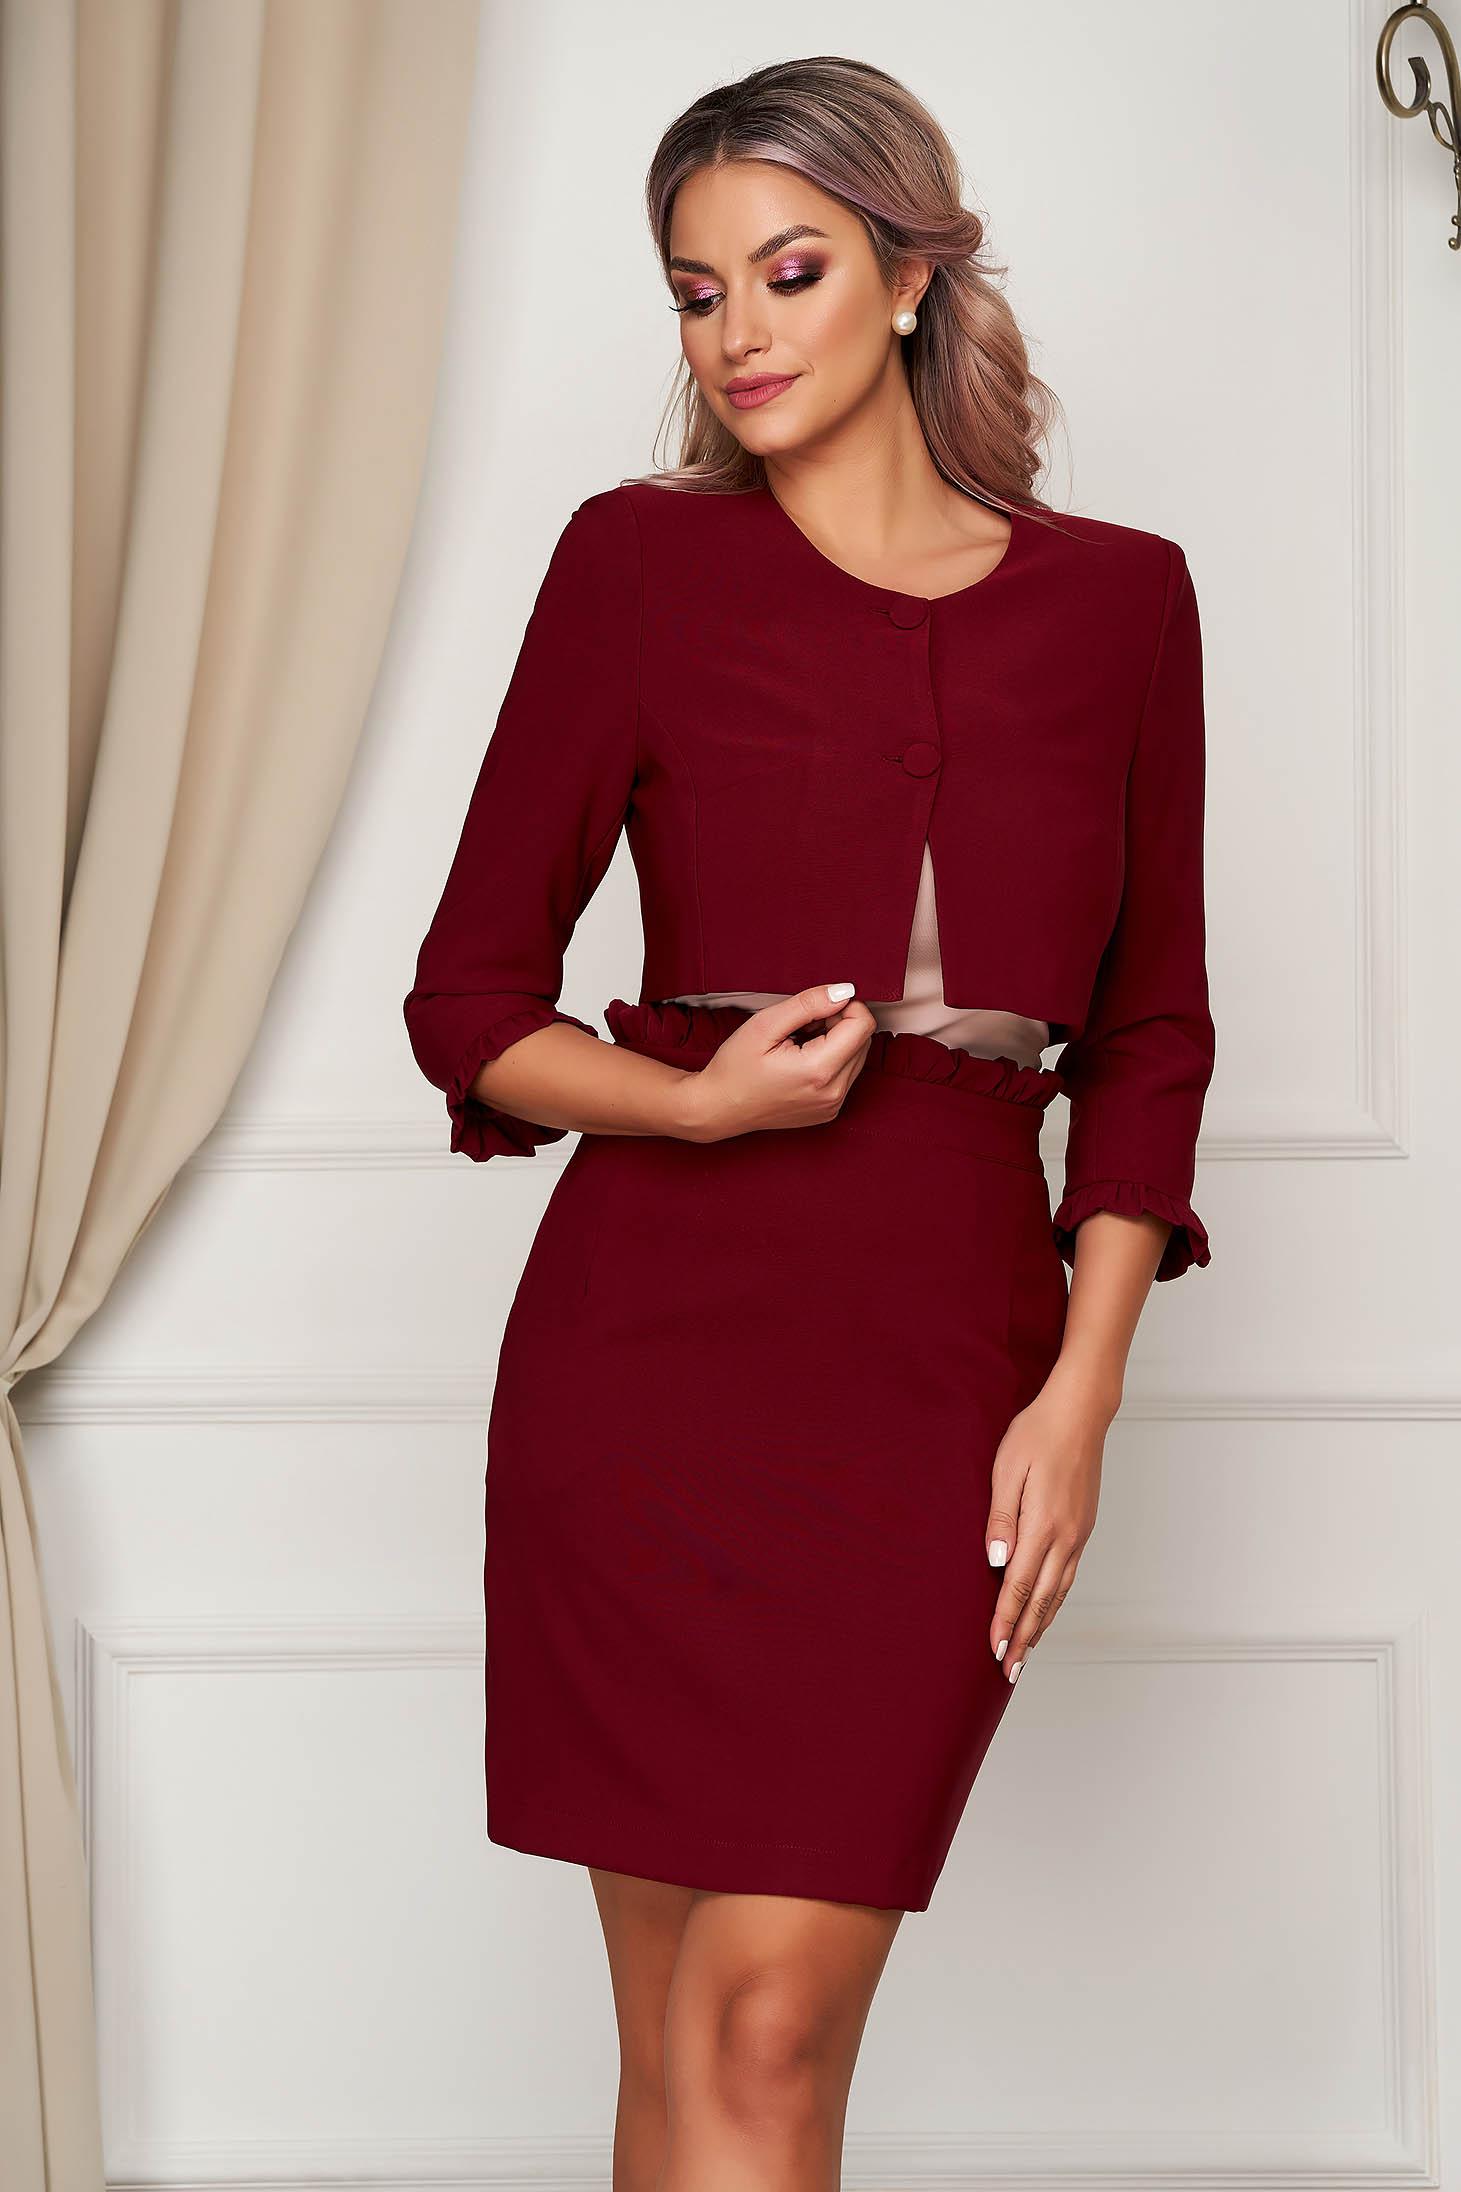 Office short cut burgundy jacket flared thin fabric